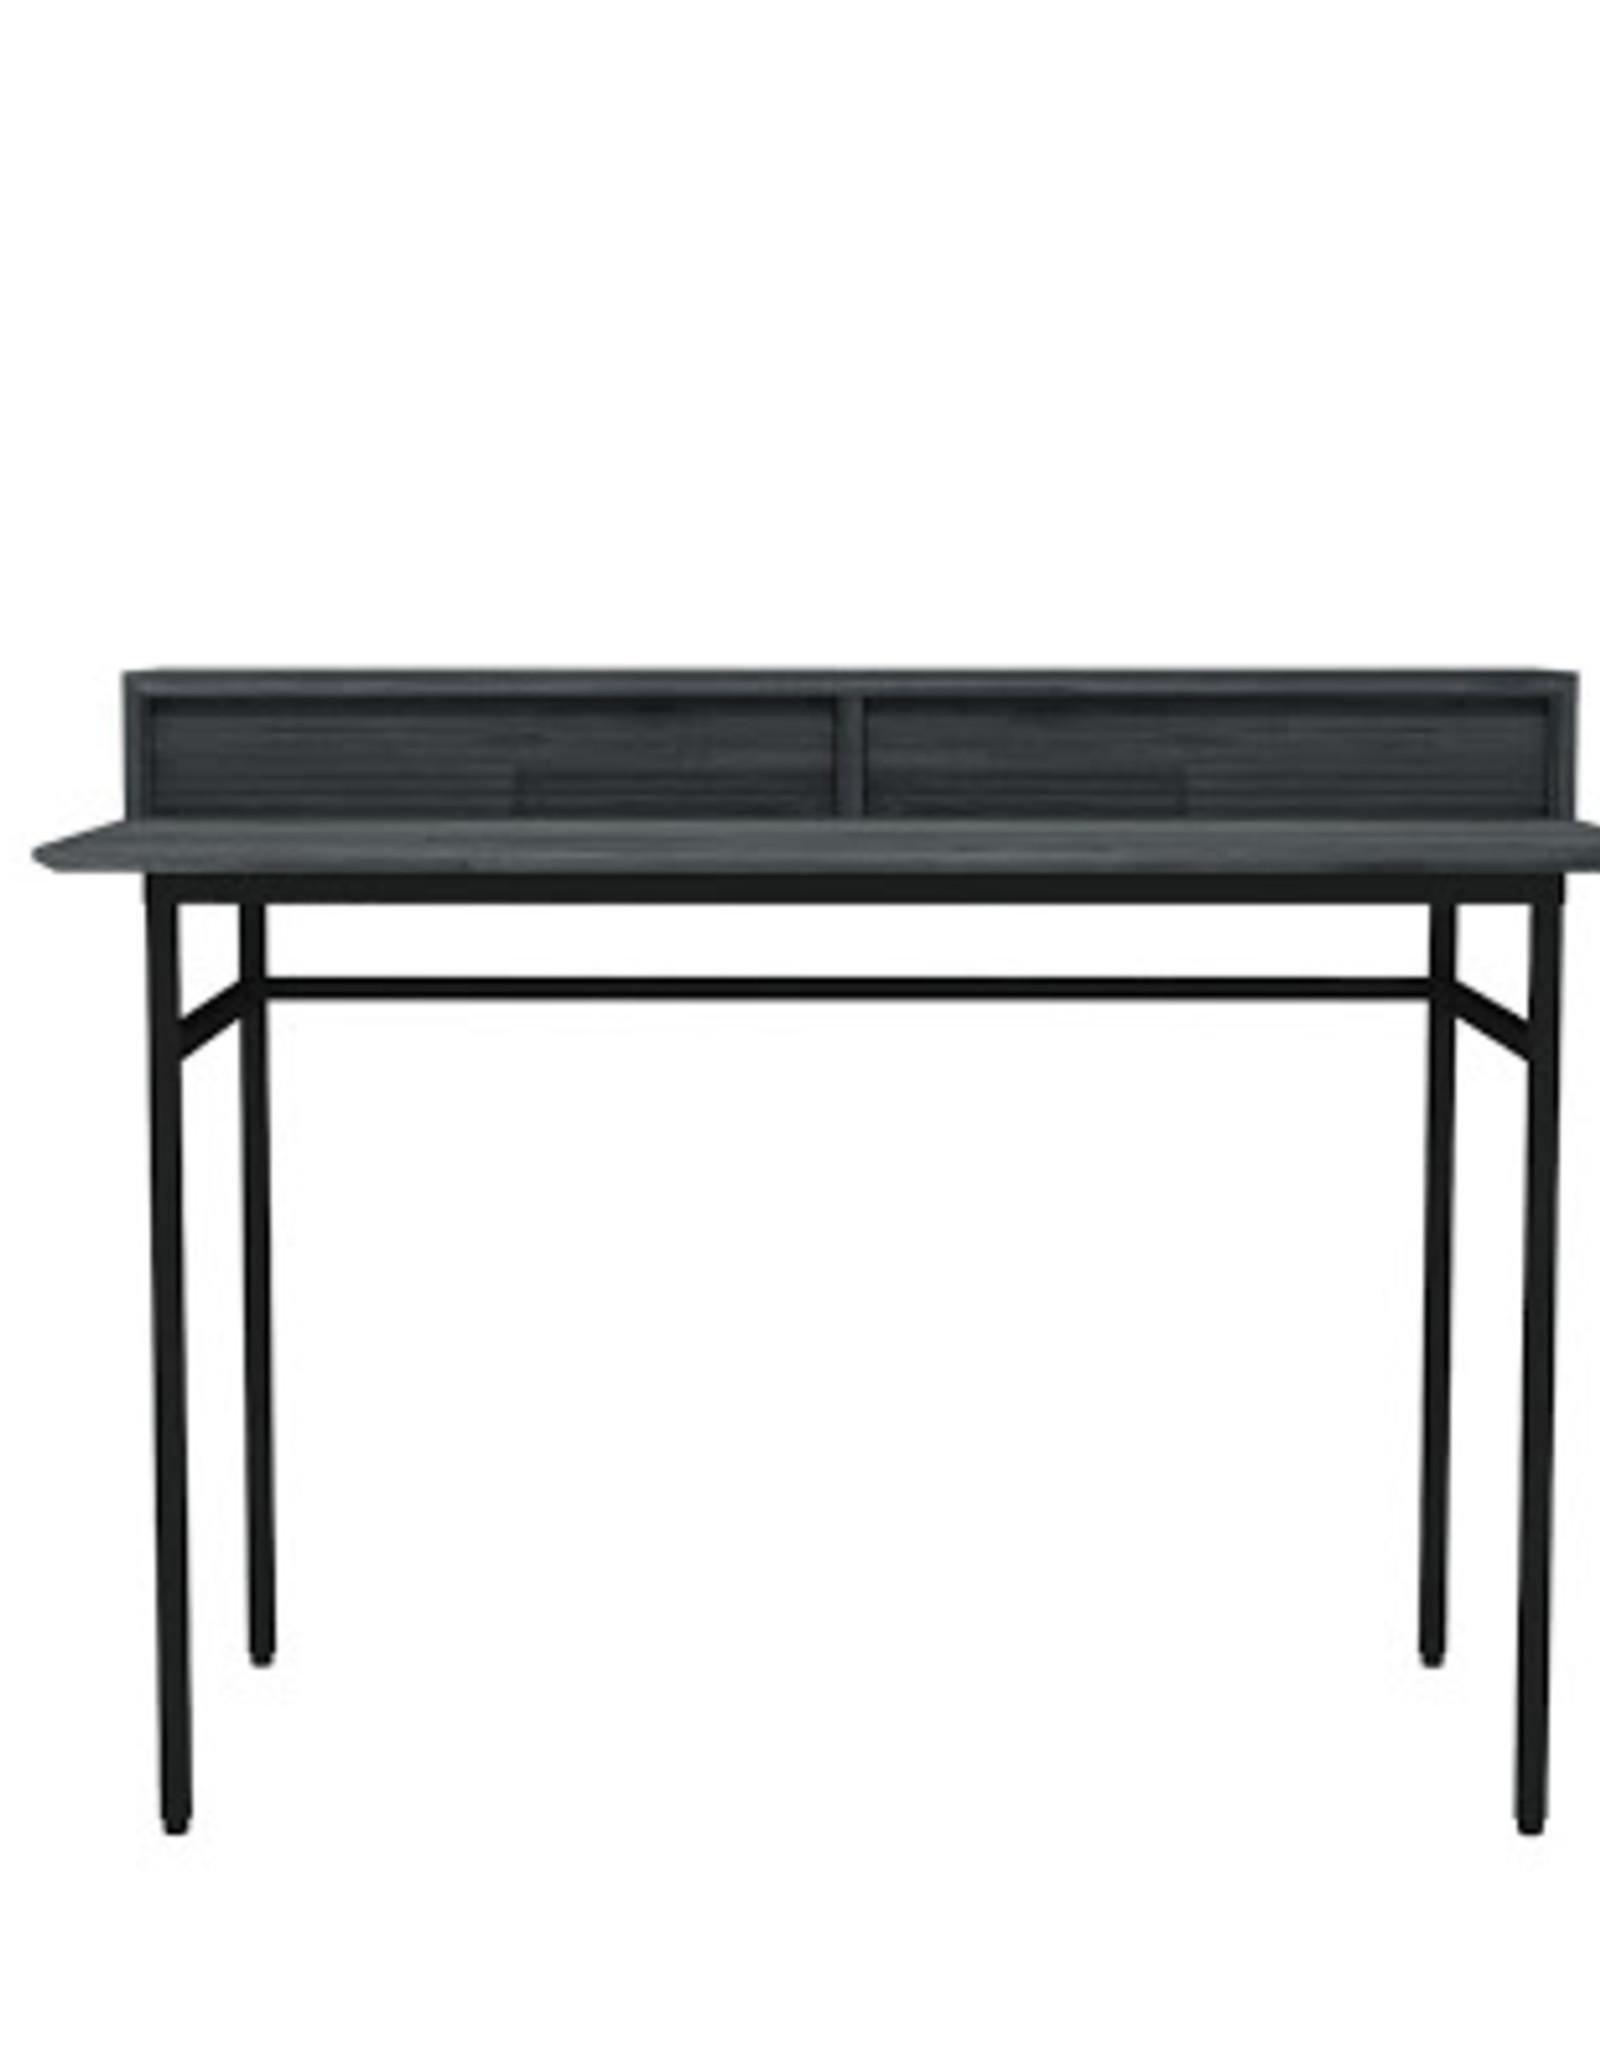 LH Imports LH Nova Desk NOV009*